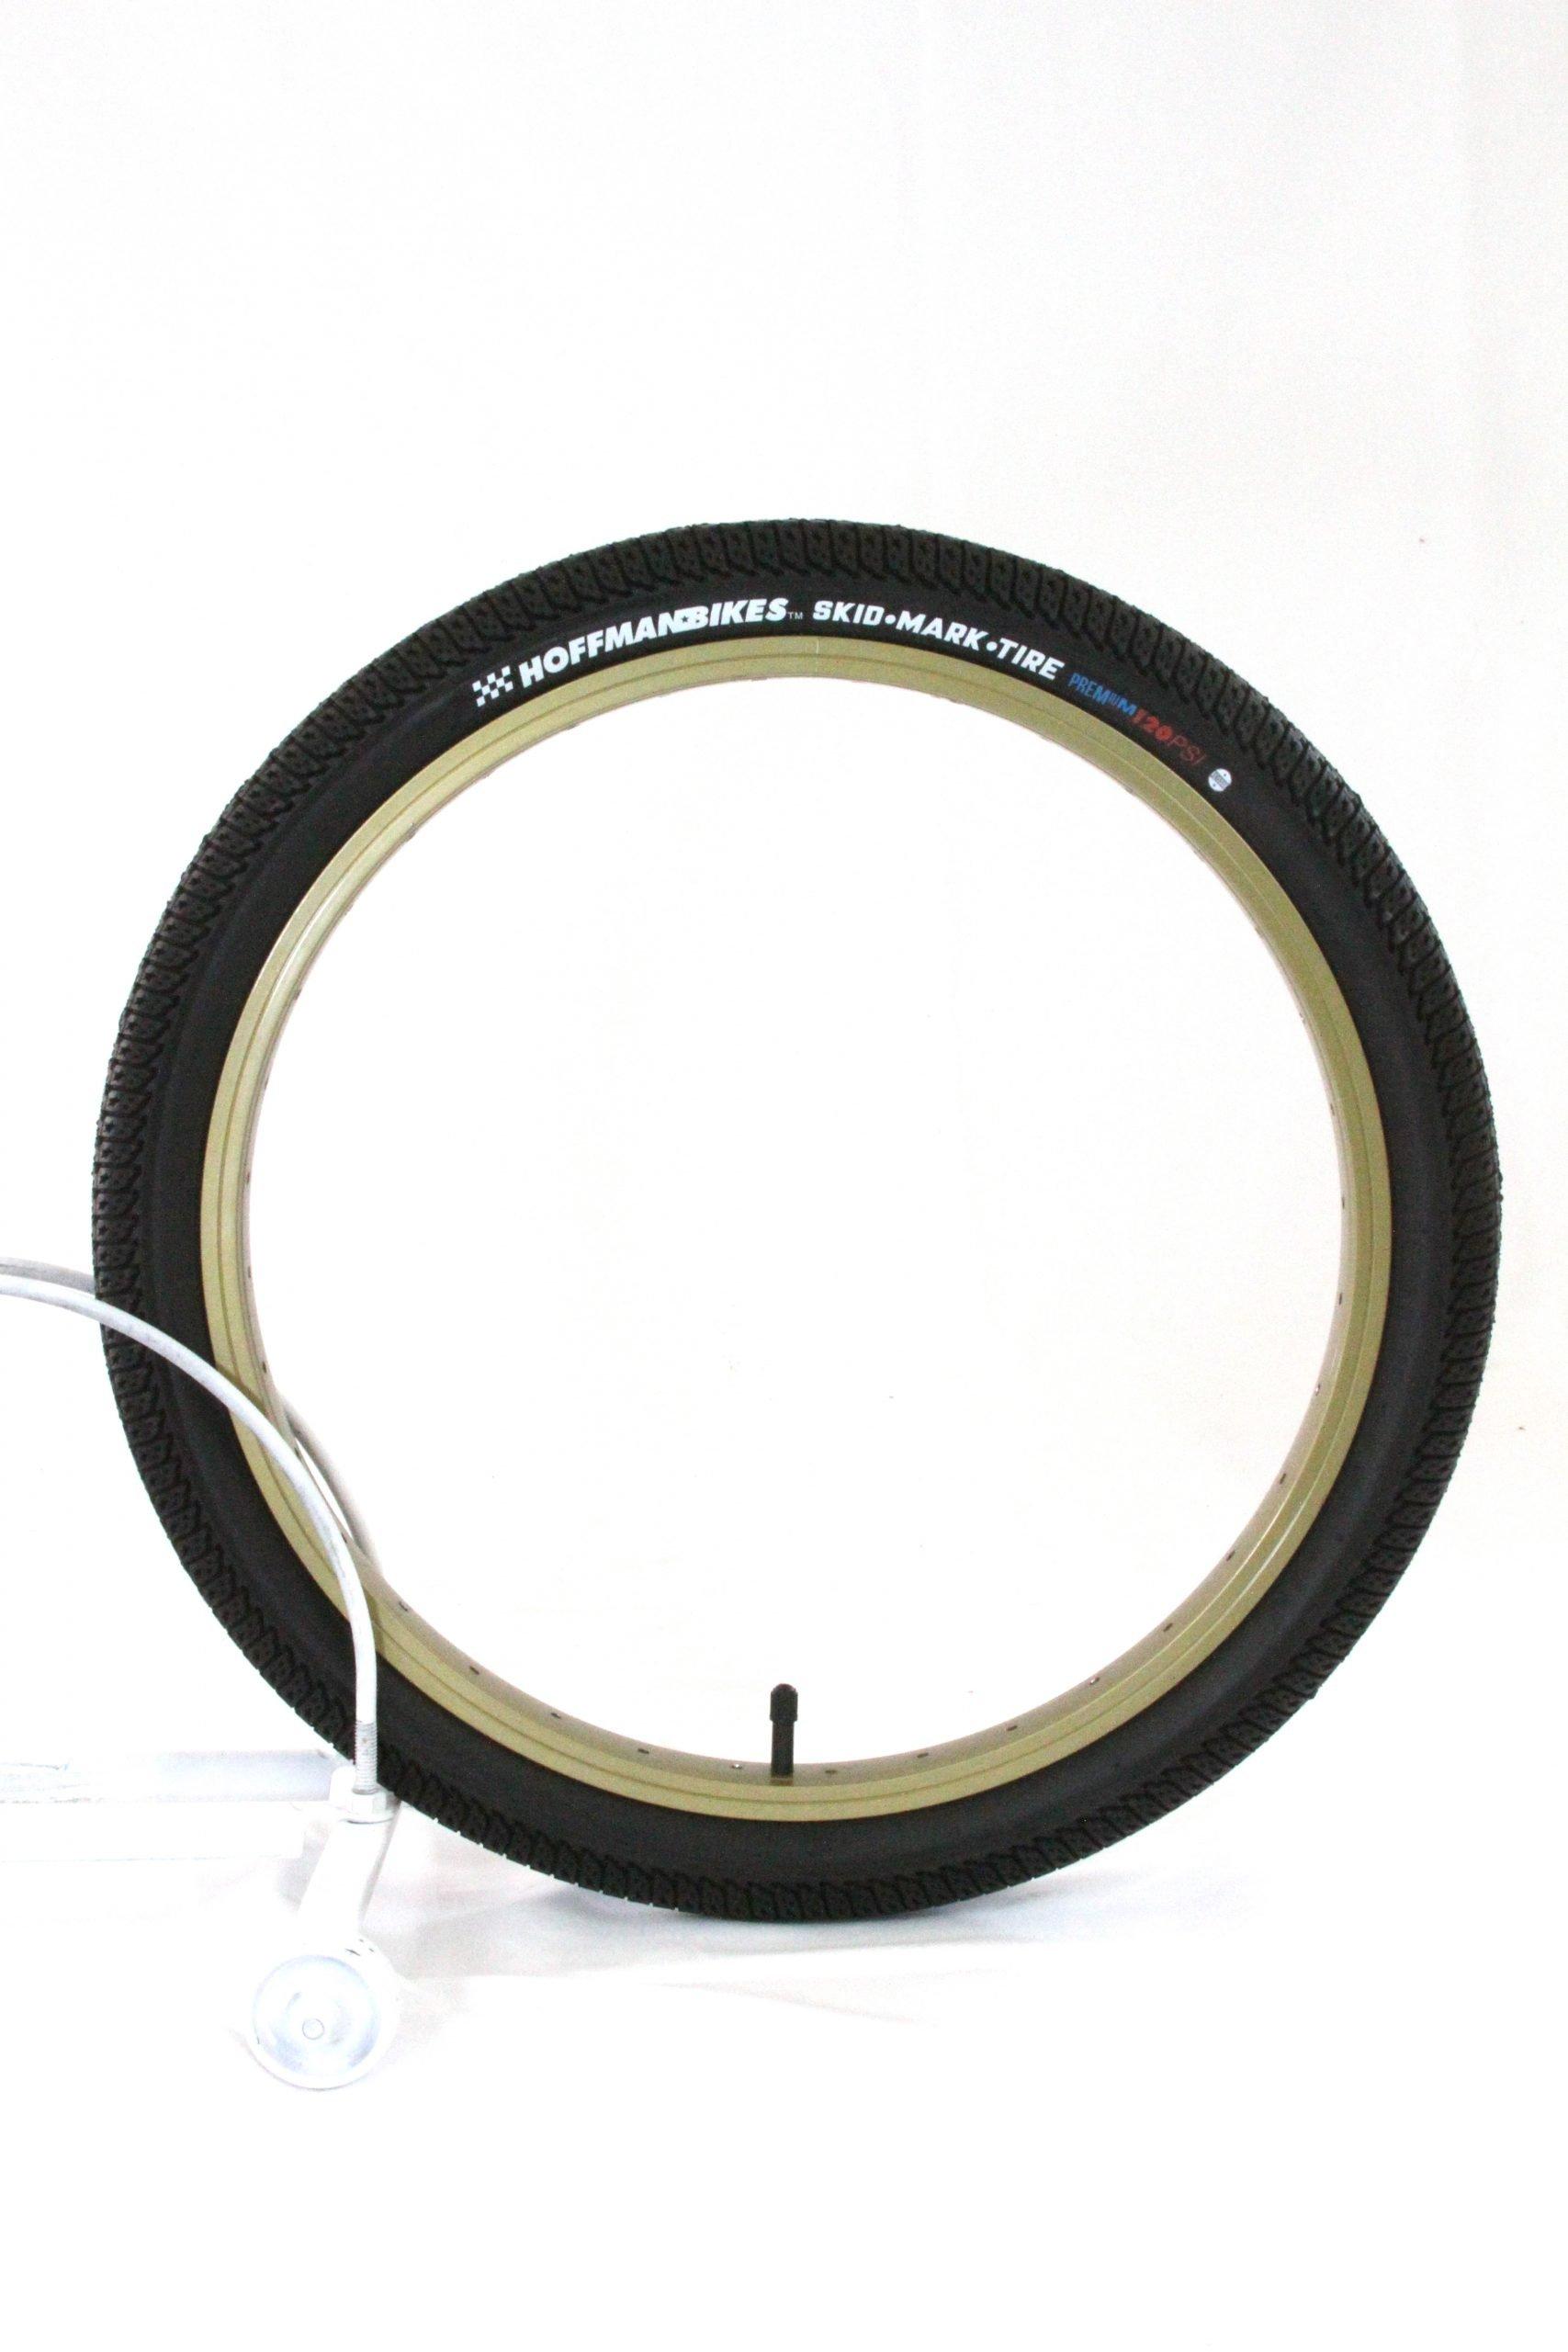 20x1.95 Black Hoffman Bikes Skidmark Tyre